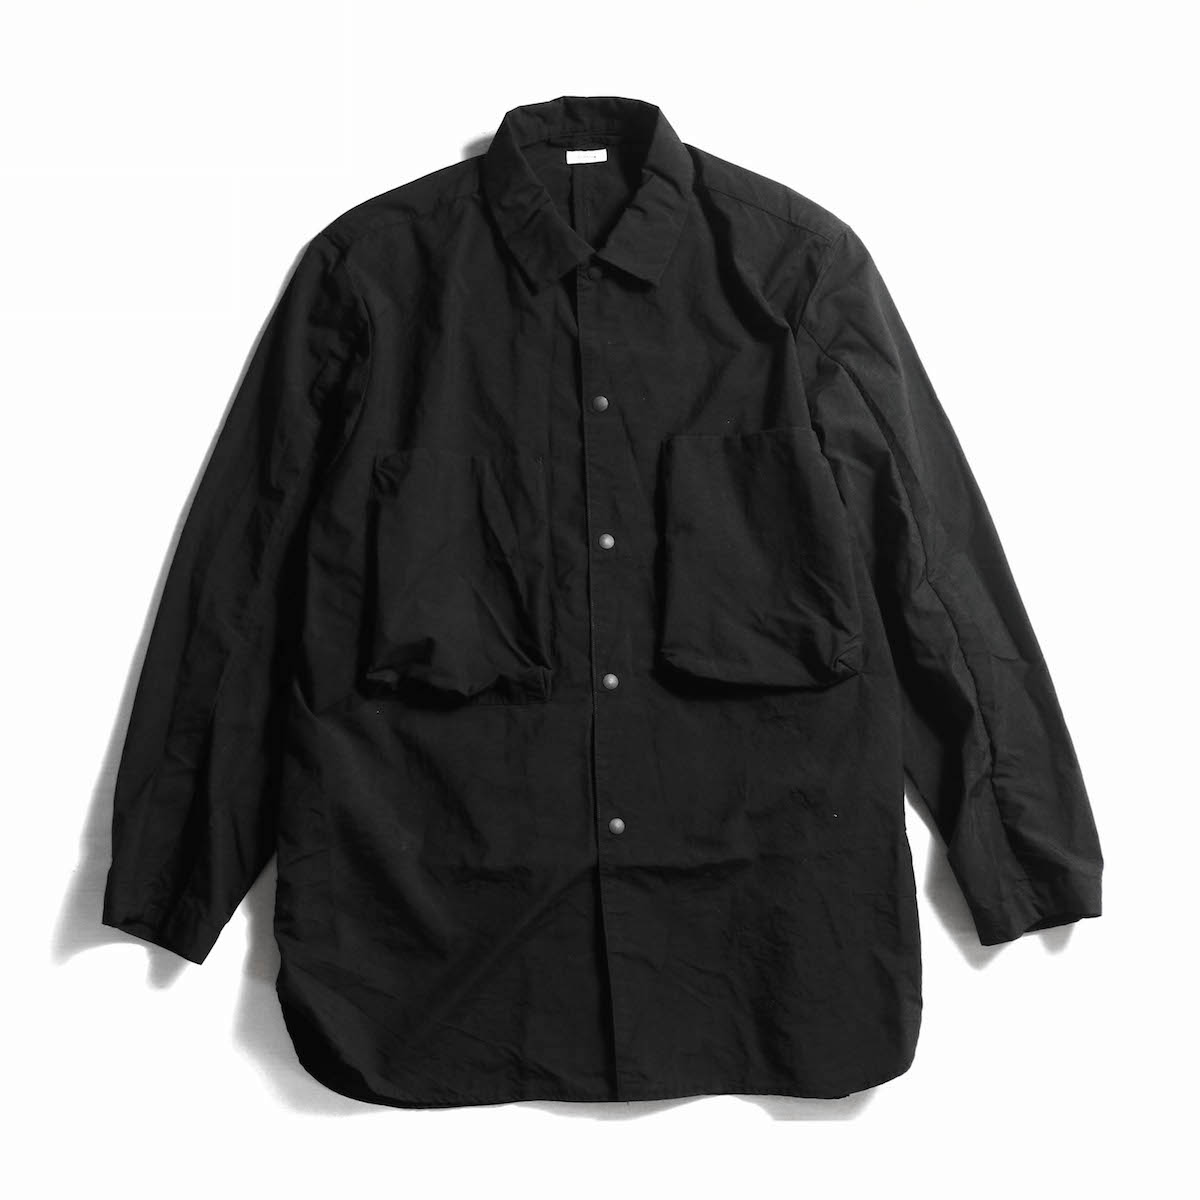 blurhms / Nylon Utility Shirt Jacket